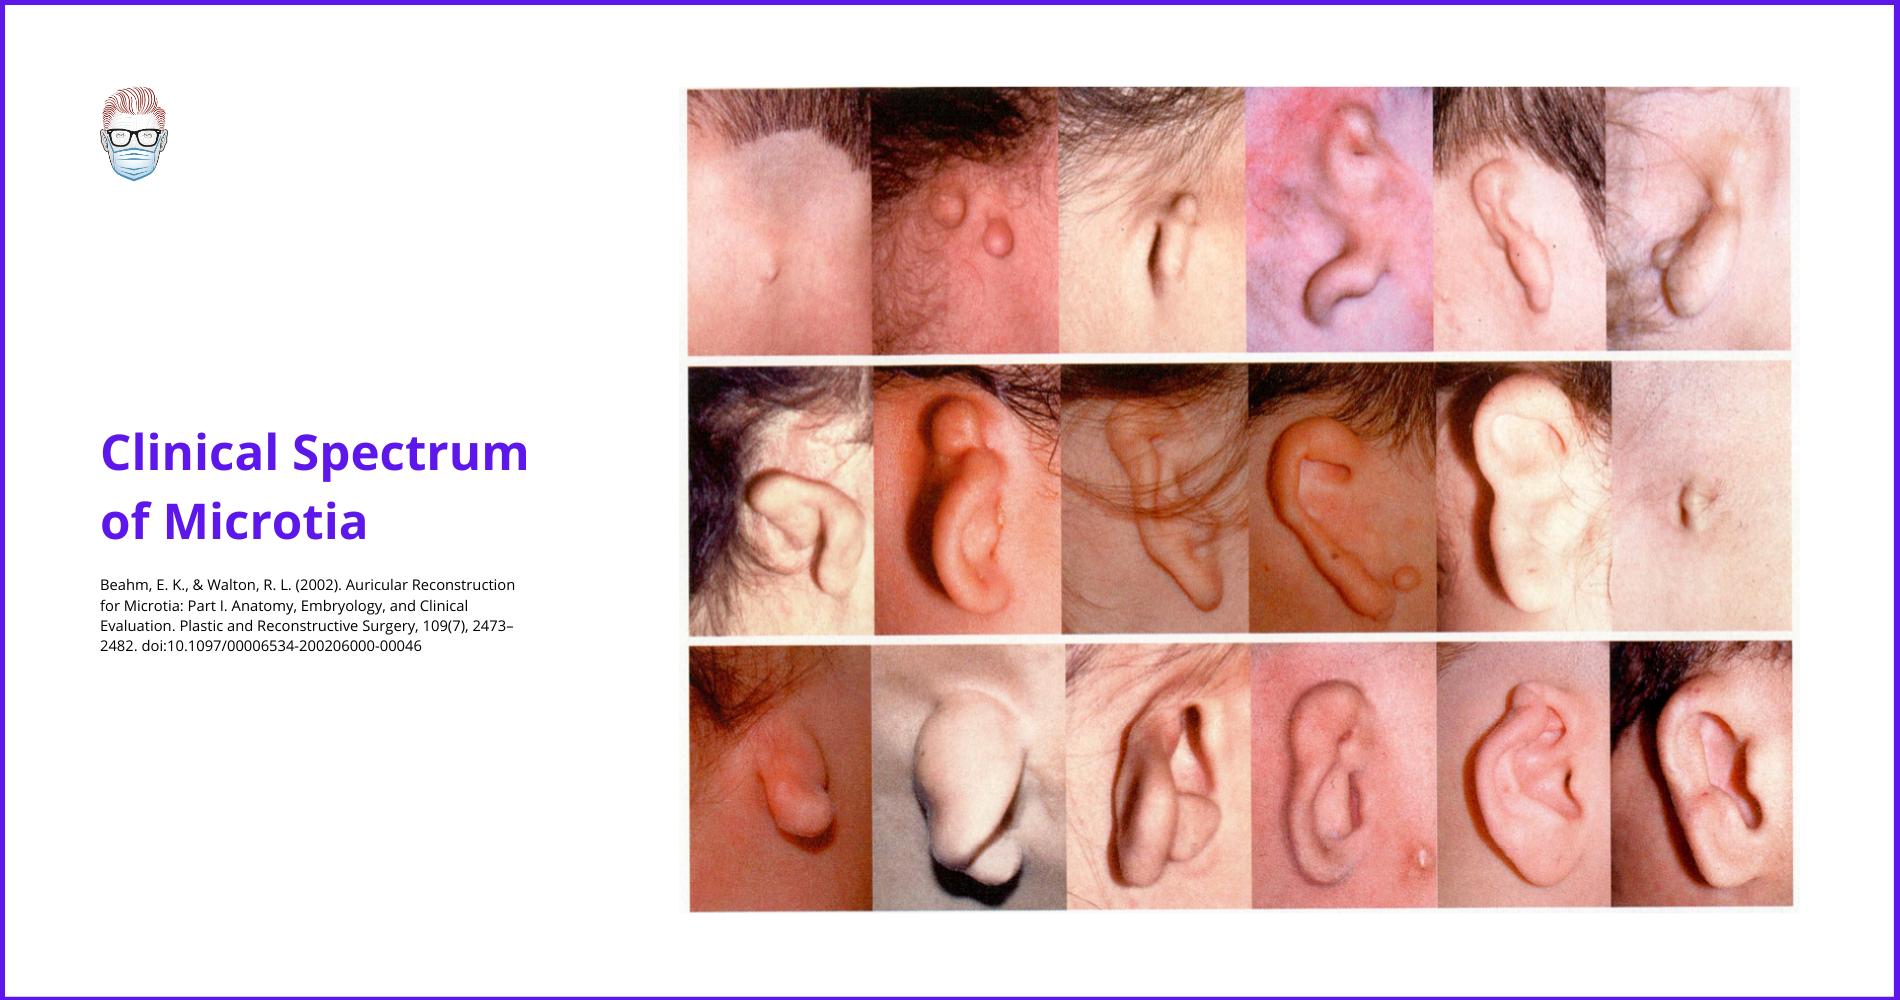 microtia, Tanzer, ear reconstruction, auricl, Brent, Nagata, surgery